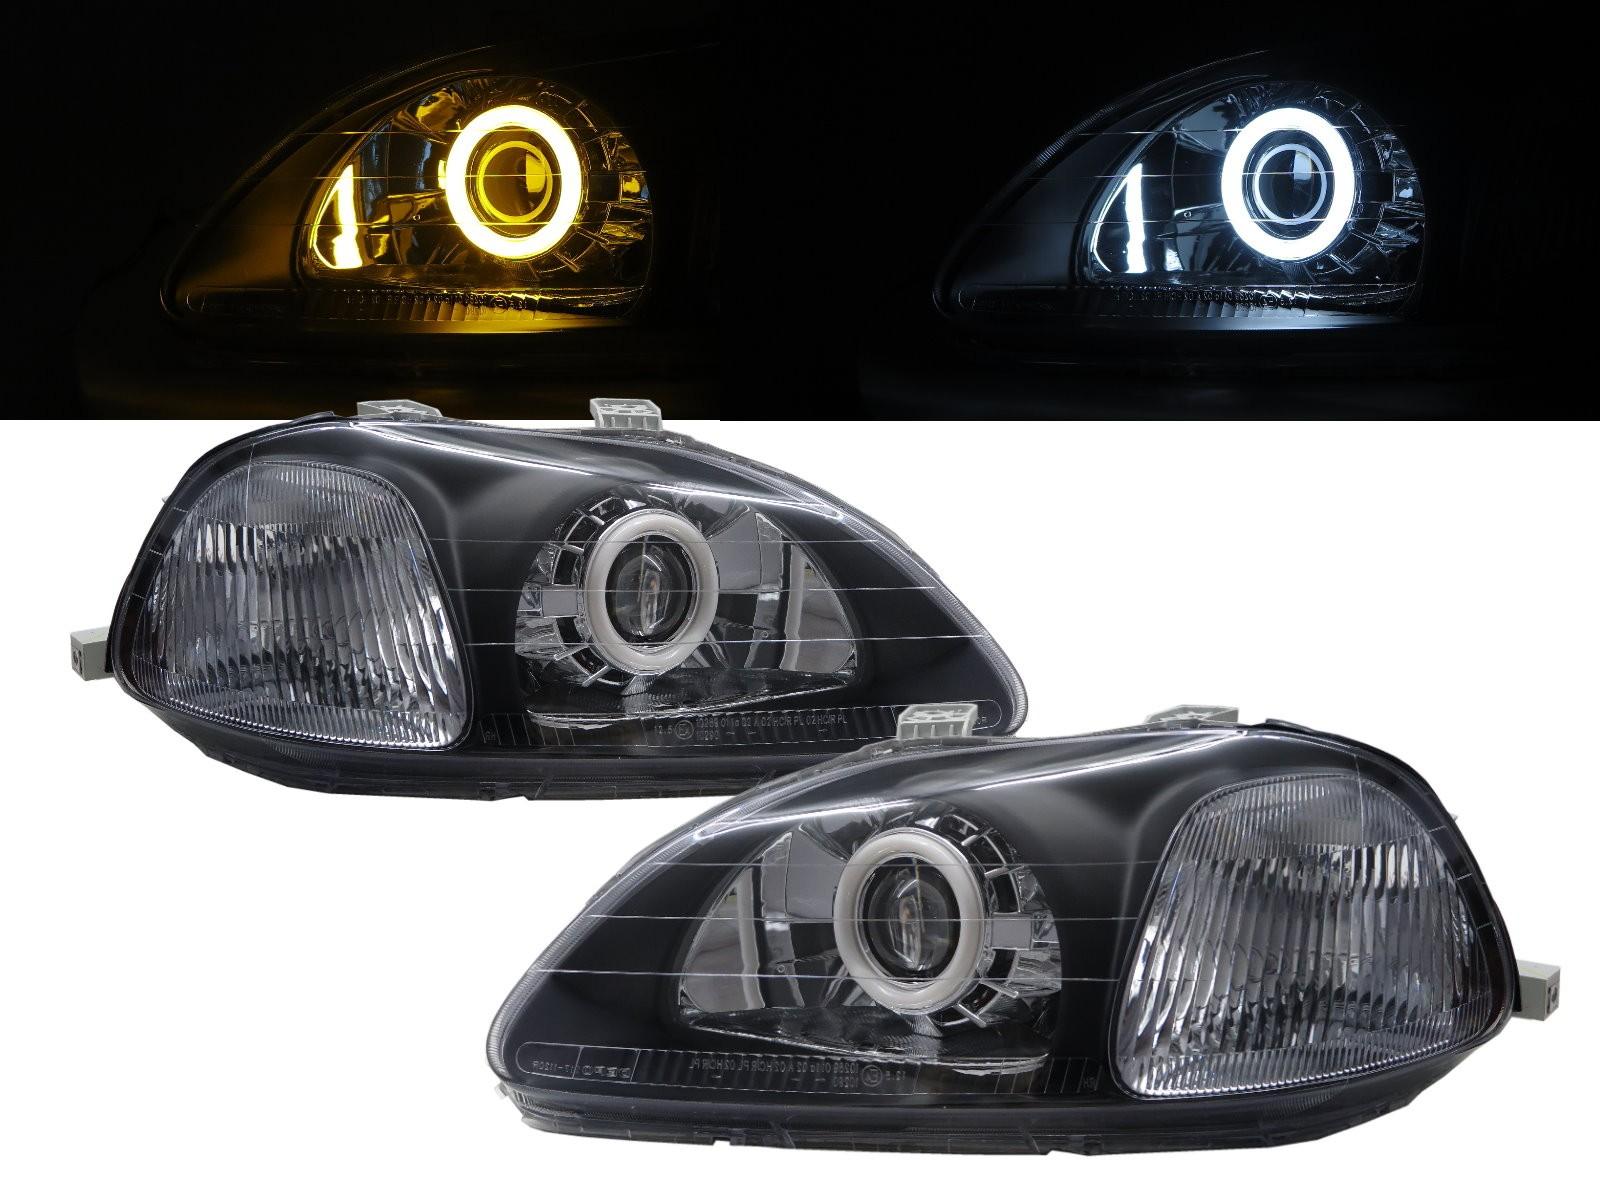 CrazyTheGod Civic EJ/EK/EM Sixth generation 1996-1998 PRE-FACELIFT Sedan/Hatchback/Coupe 2D/3D/4D/5D Cotton Halo Bi-Projector Headlight Headlamp Black for HONDA LHD